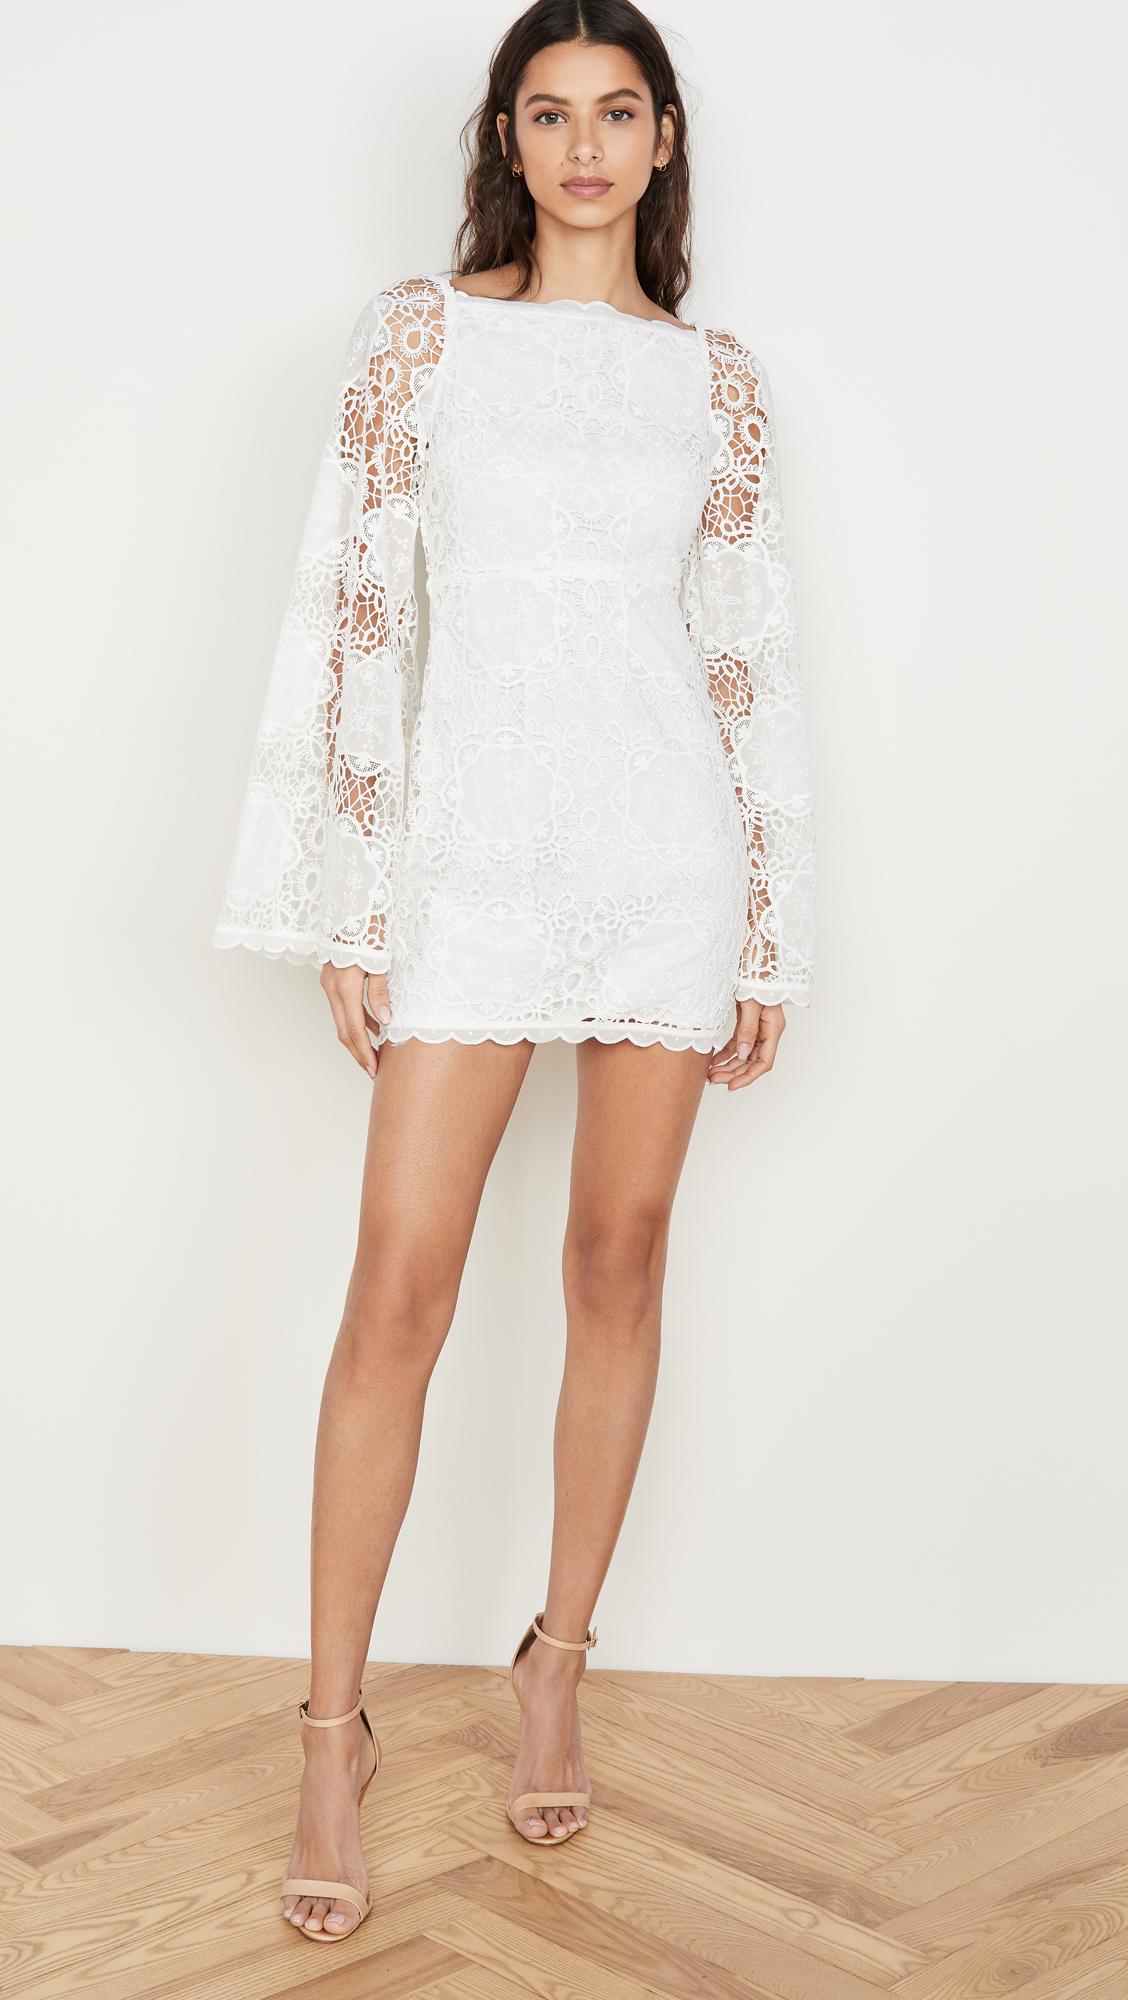 Boho Short Wedding Dresses